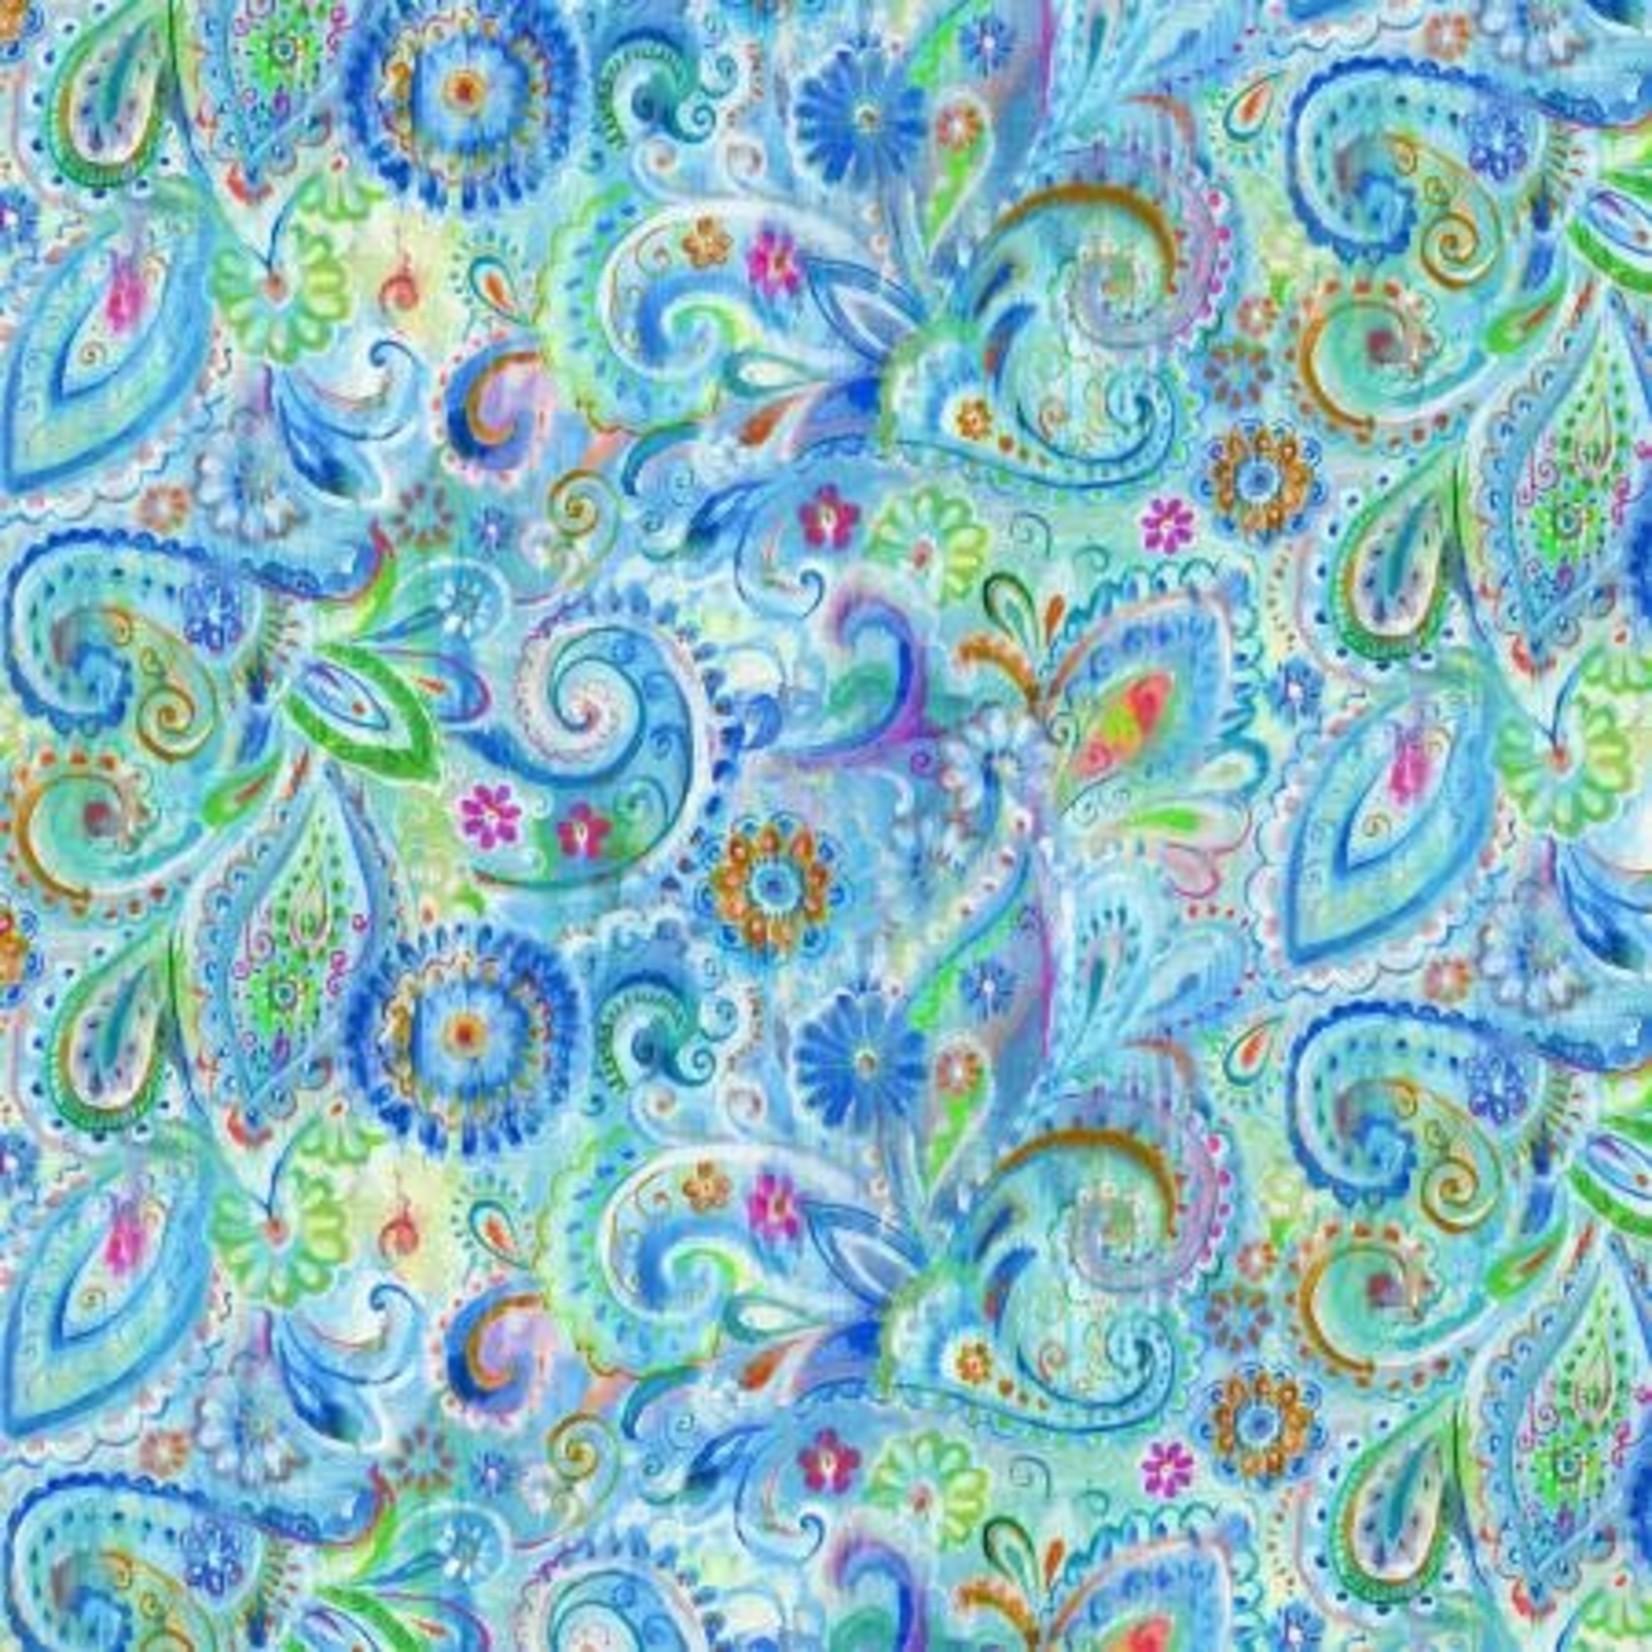 Wilmington Prints Bohemian Dreams - Dream Paisley - Blue